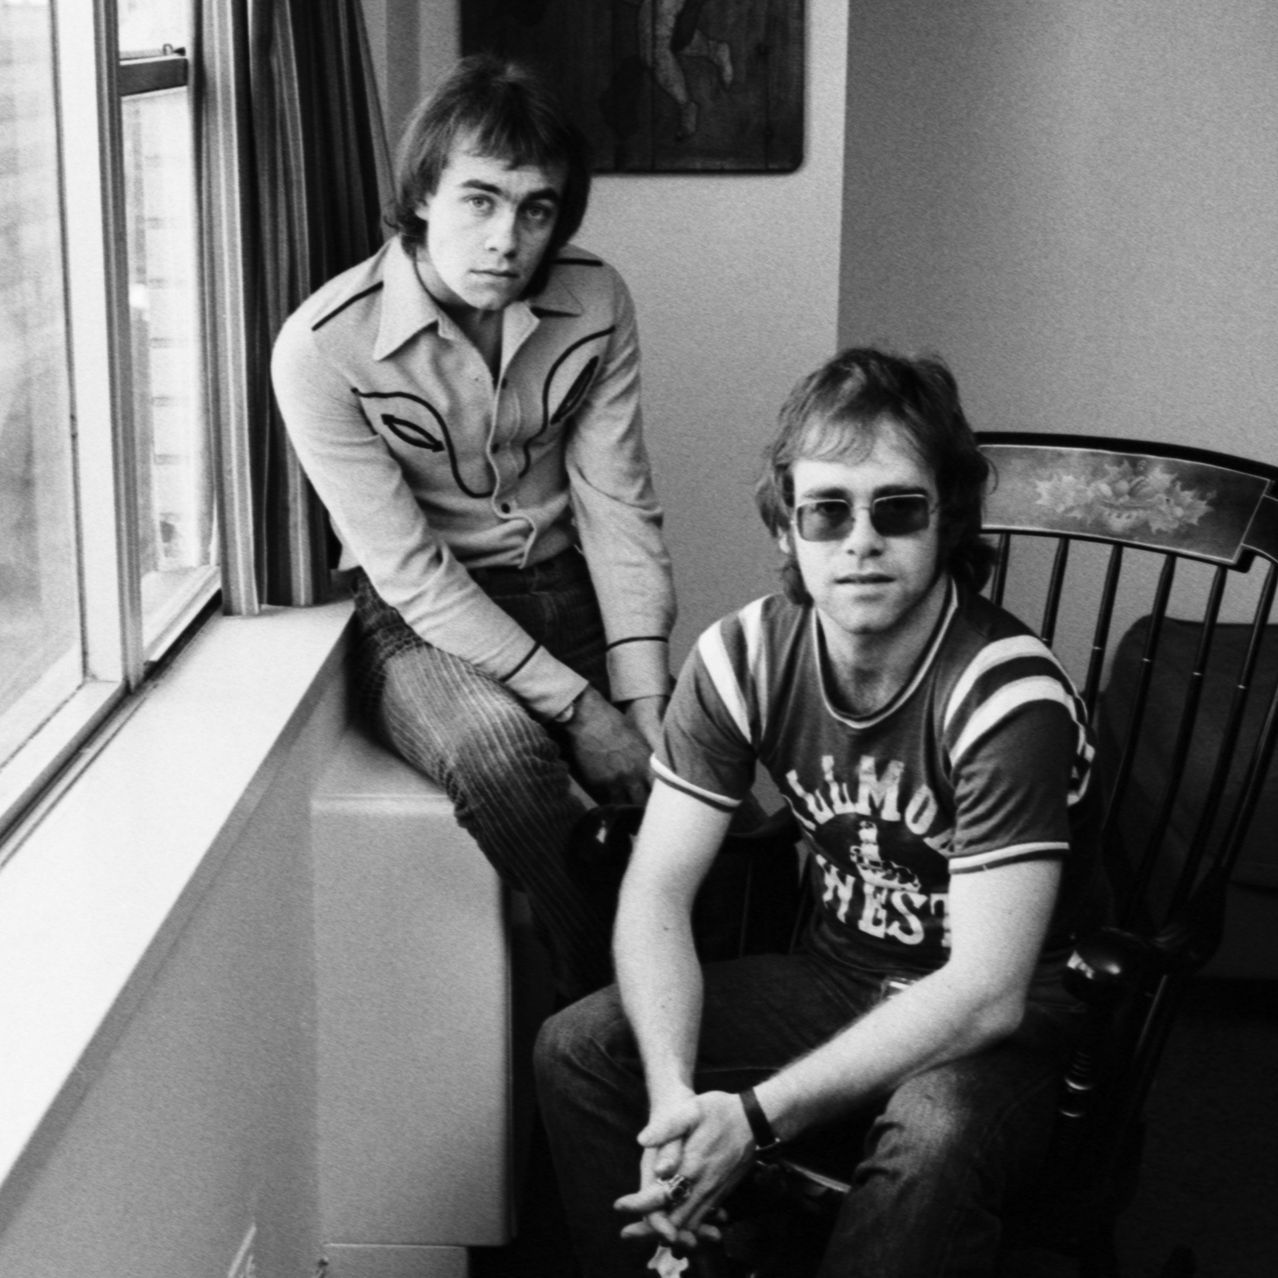 Bernie Taupin Left And Elton John In November 1970 In New York Elton John Bernie Taupin Elton Jon